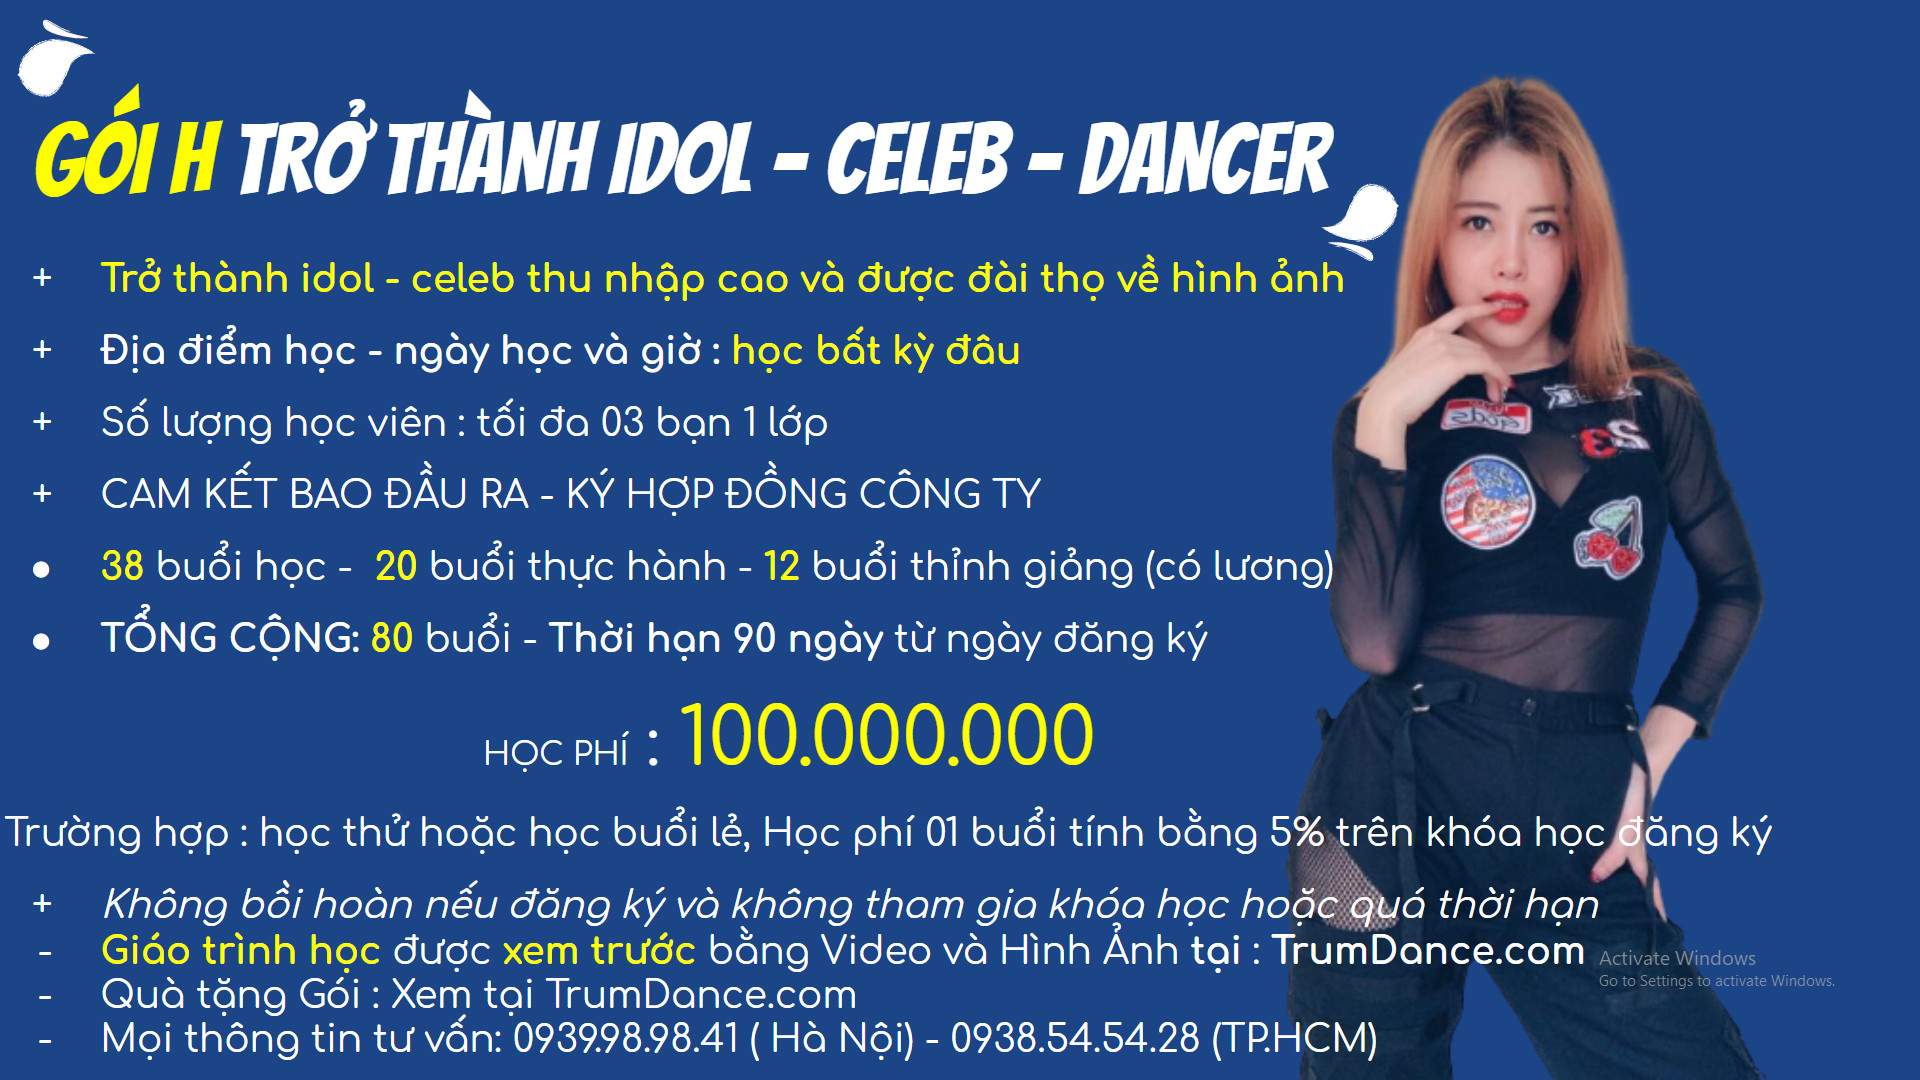 Bảng học phí học nhảy Trumdance - Lớp iDol - Celeb - Dancer